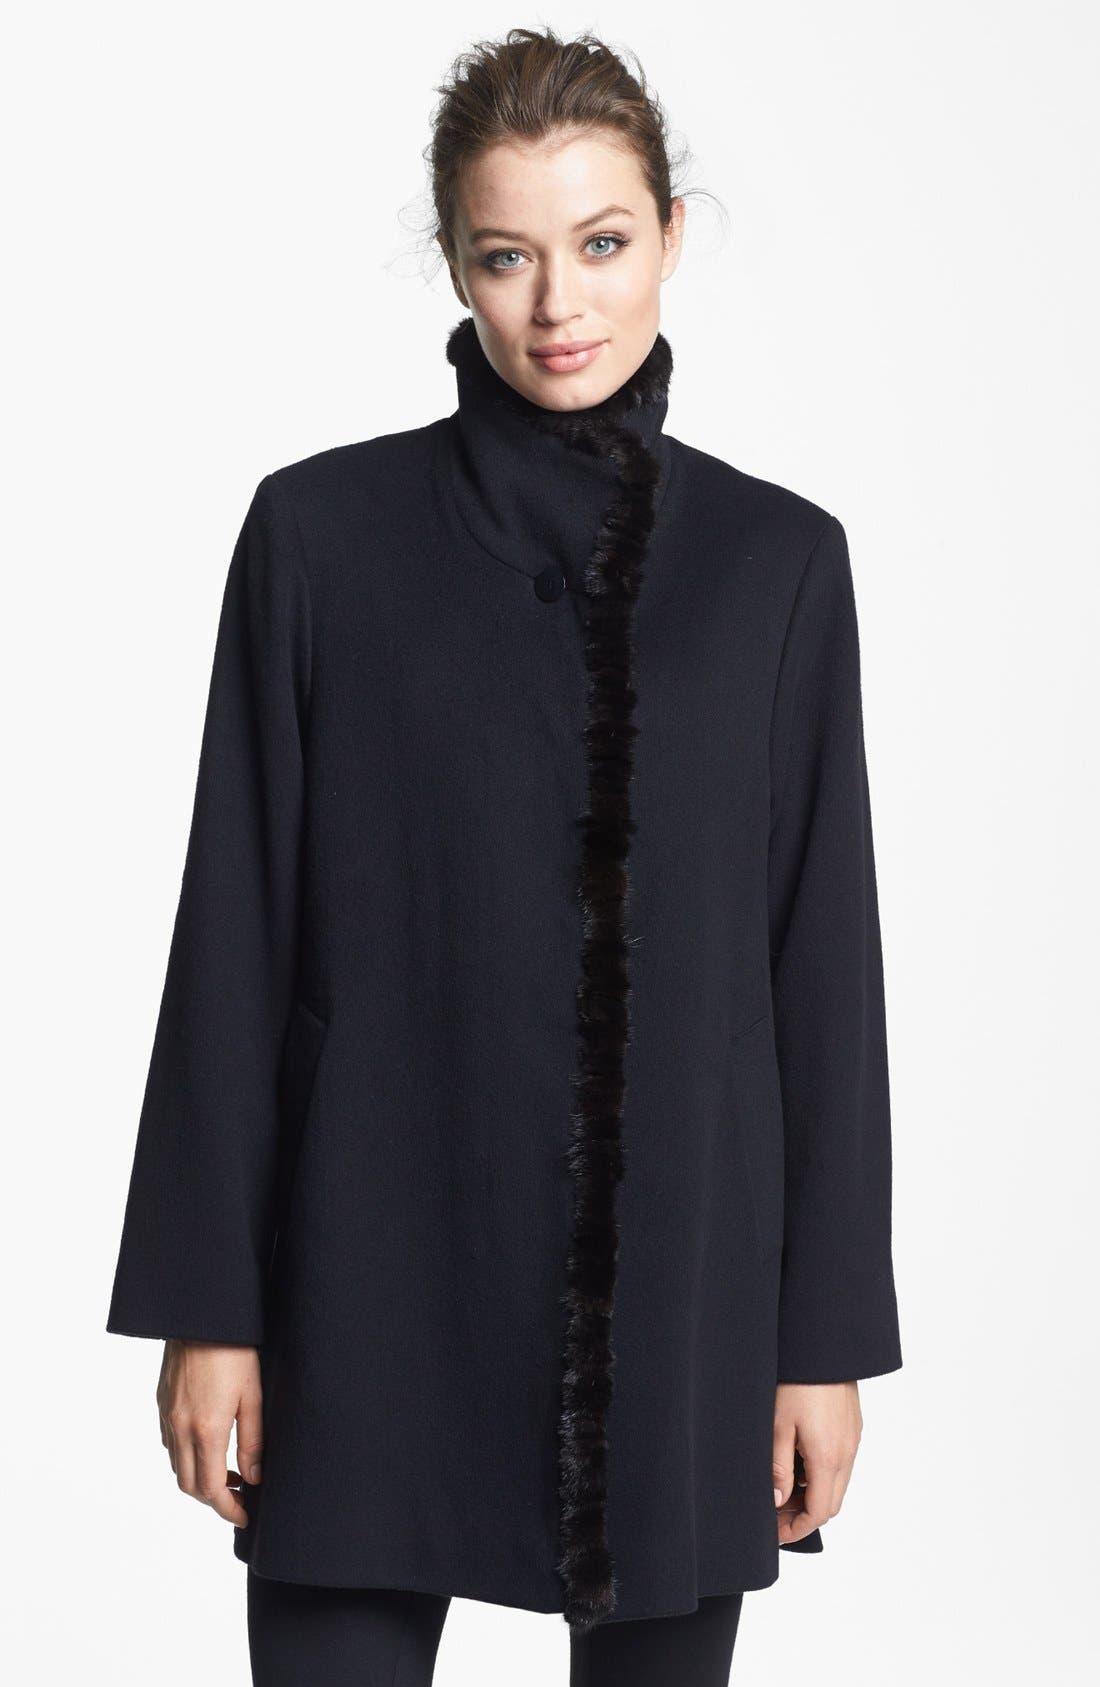 Main Image - Fleurette Genuine Mink Fur Trim Loro Piana Wool Coat (Petite)